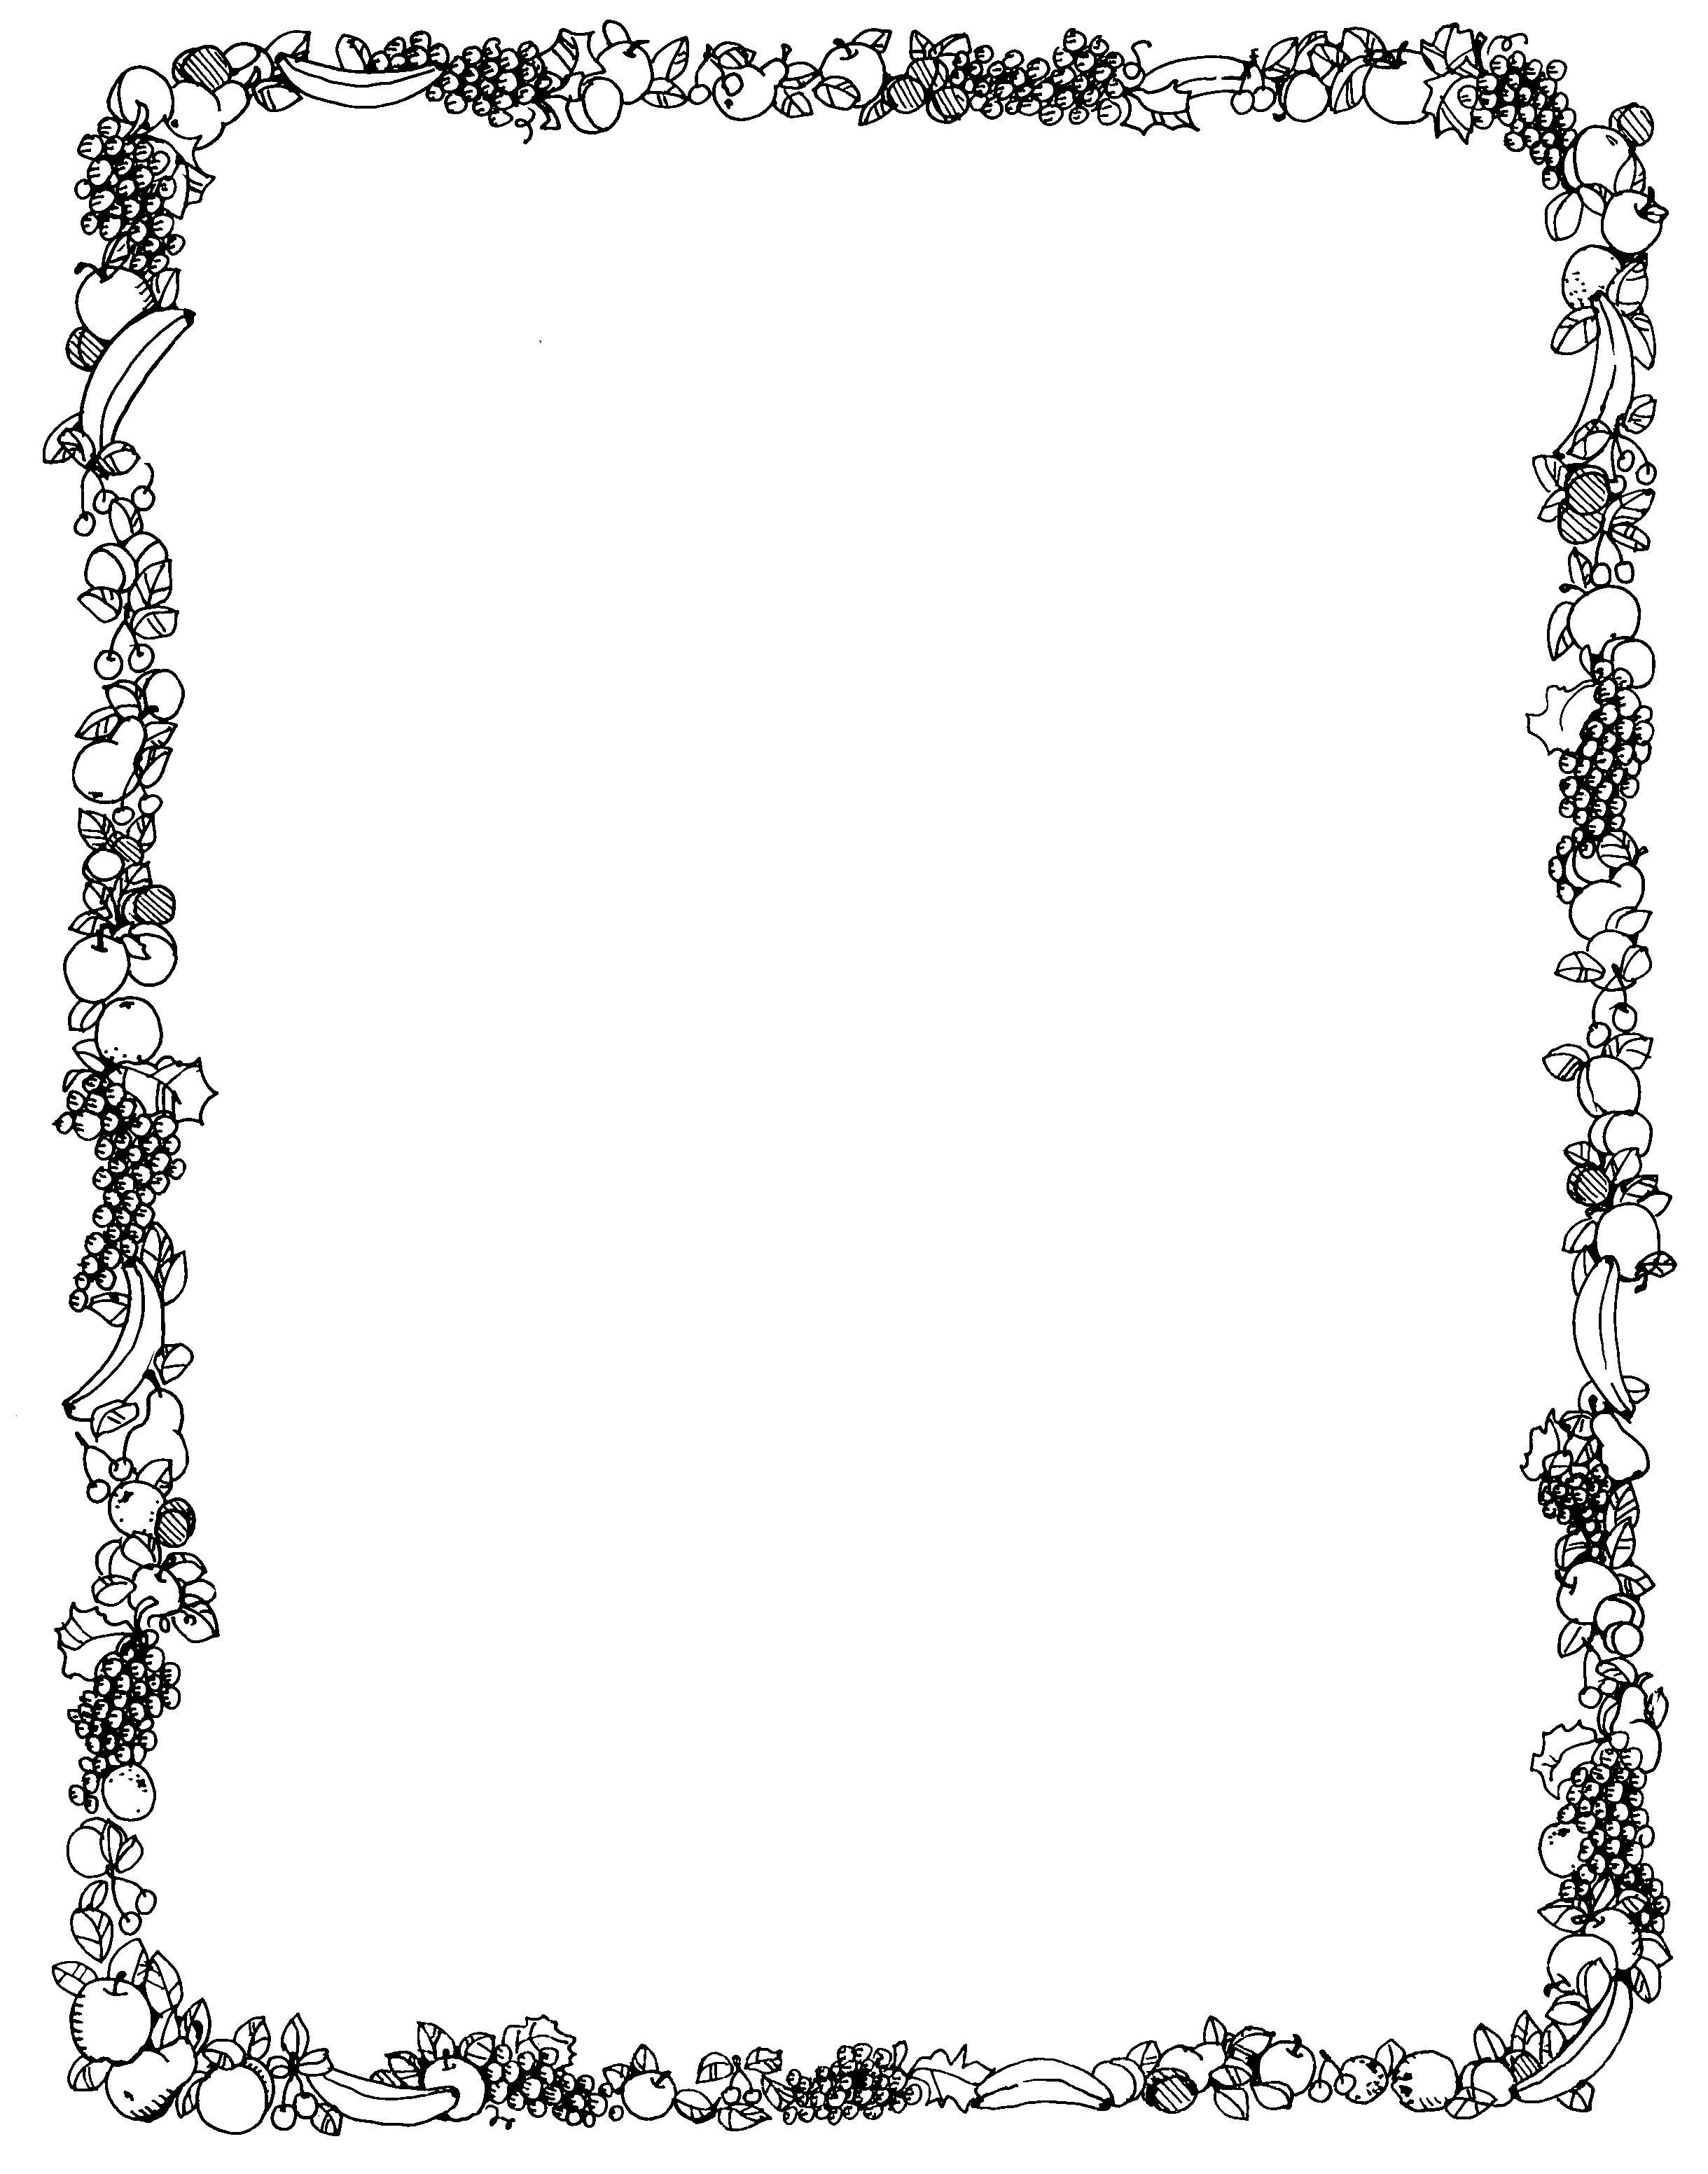 Border Clip Art Black and White